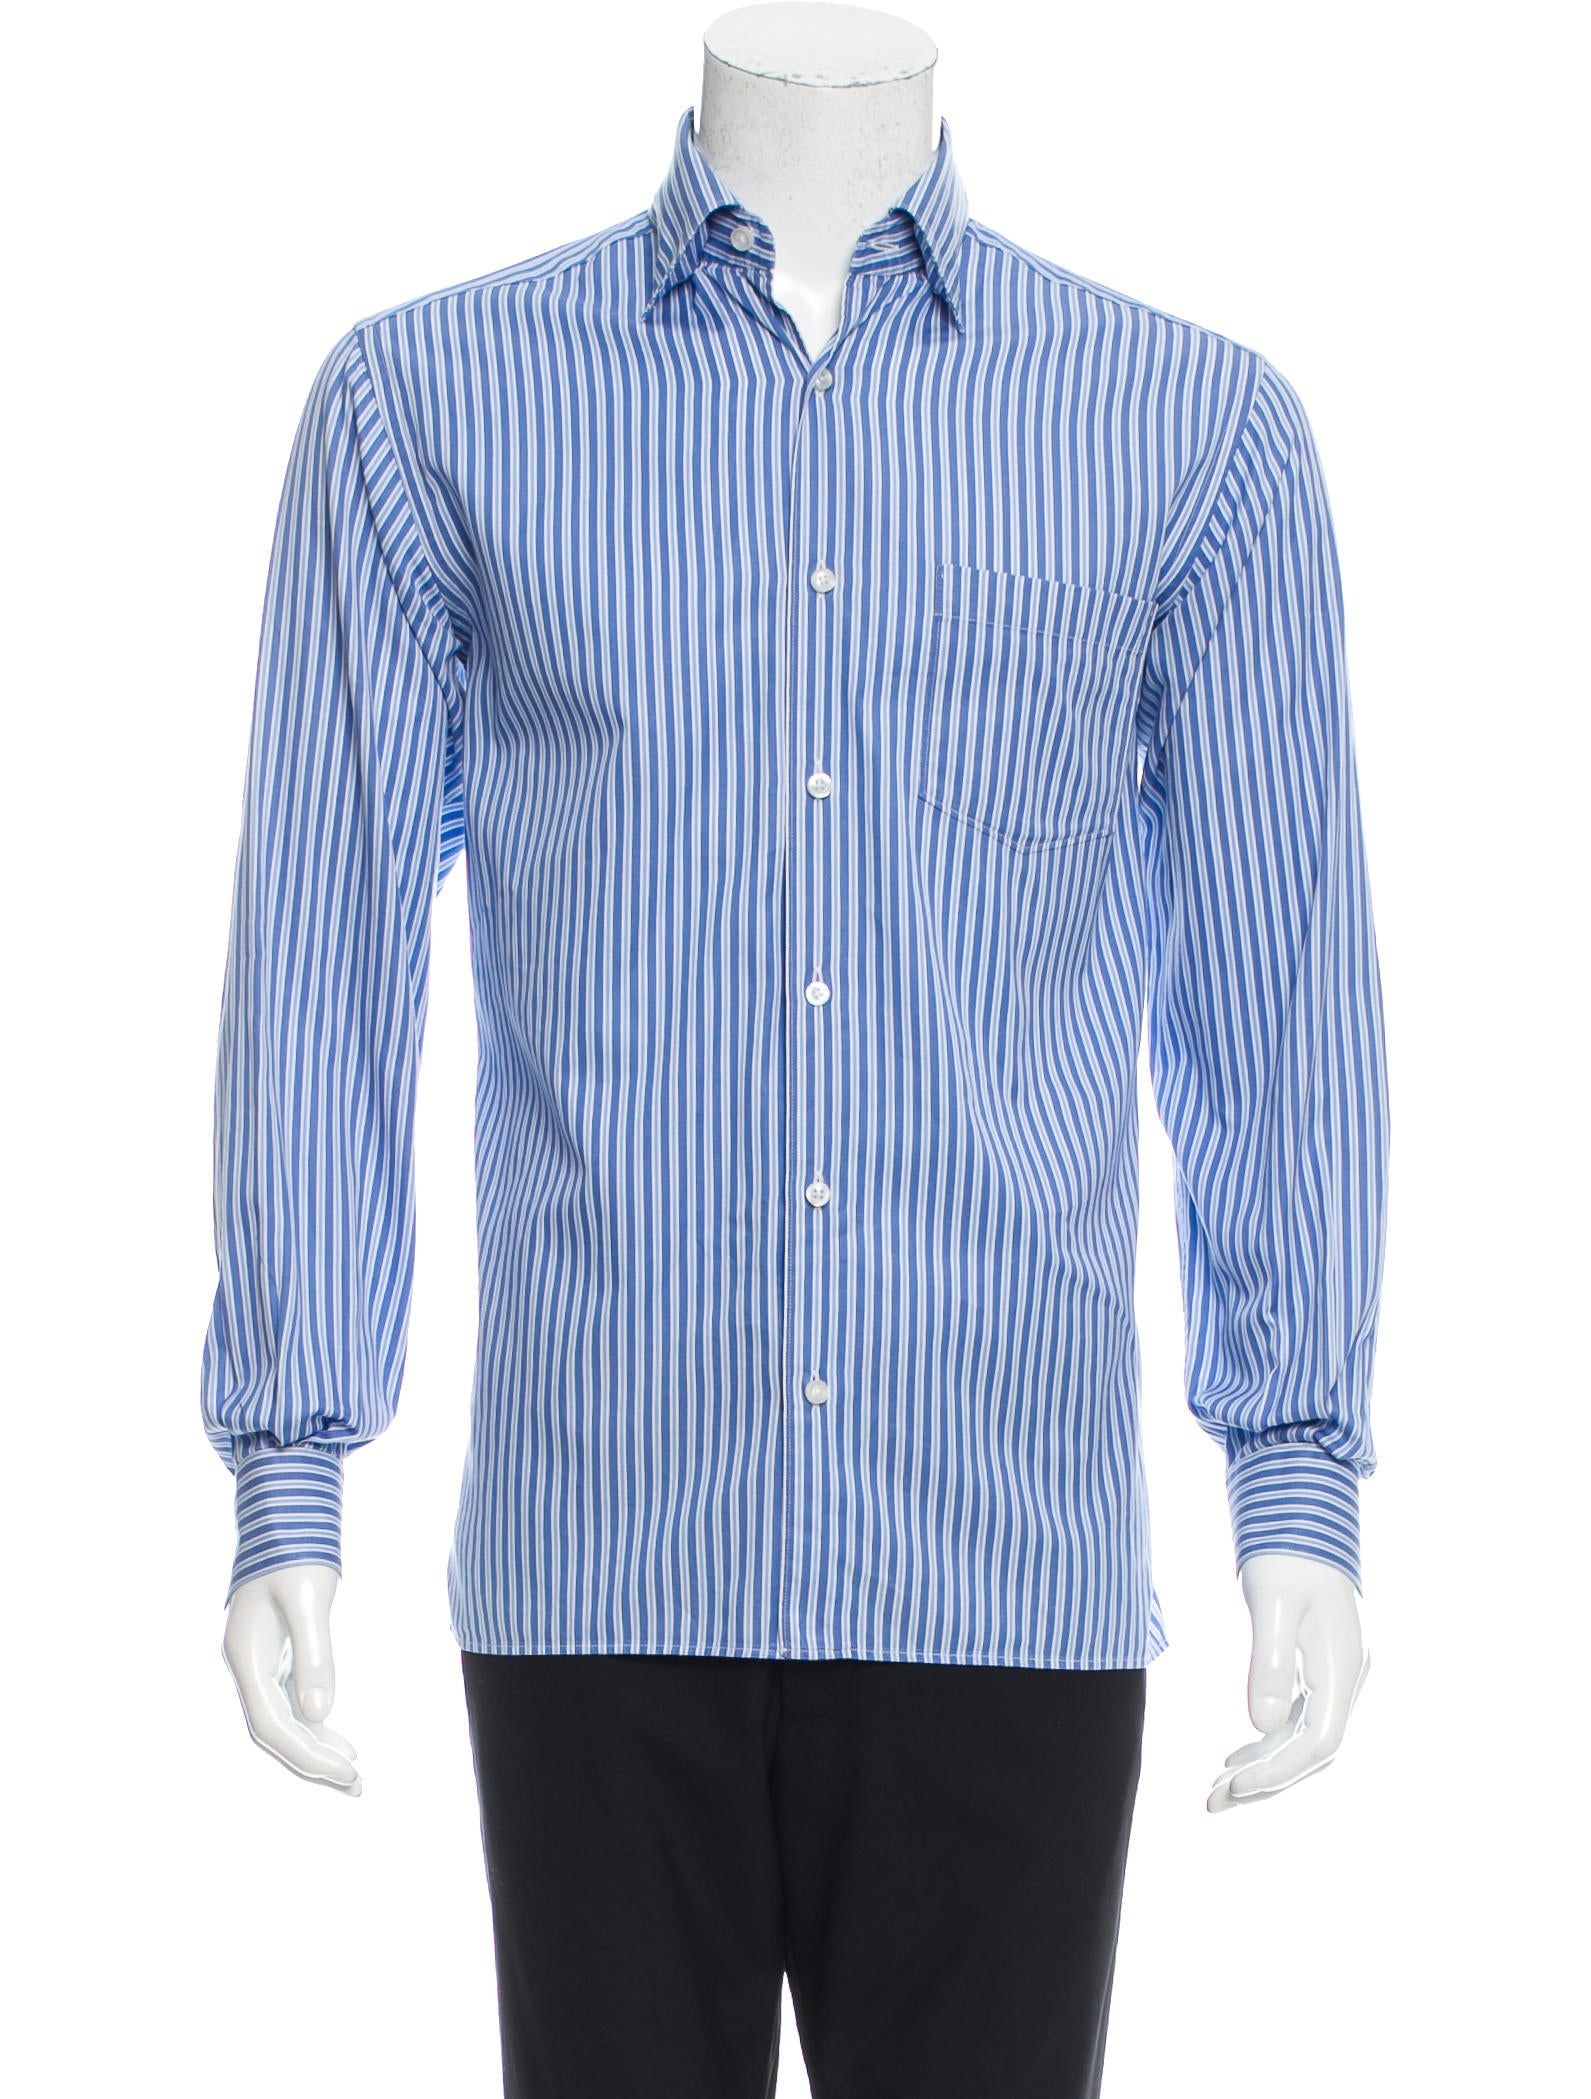 ermenegildo zegna striped button up shirt clothing zgn24433 the realreal. Black Bedroom Furniture Sets. Home Design Ideas